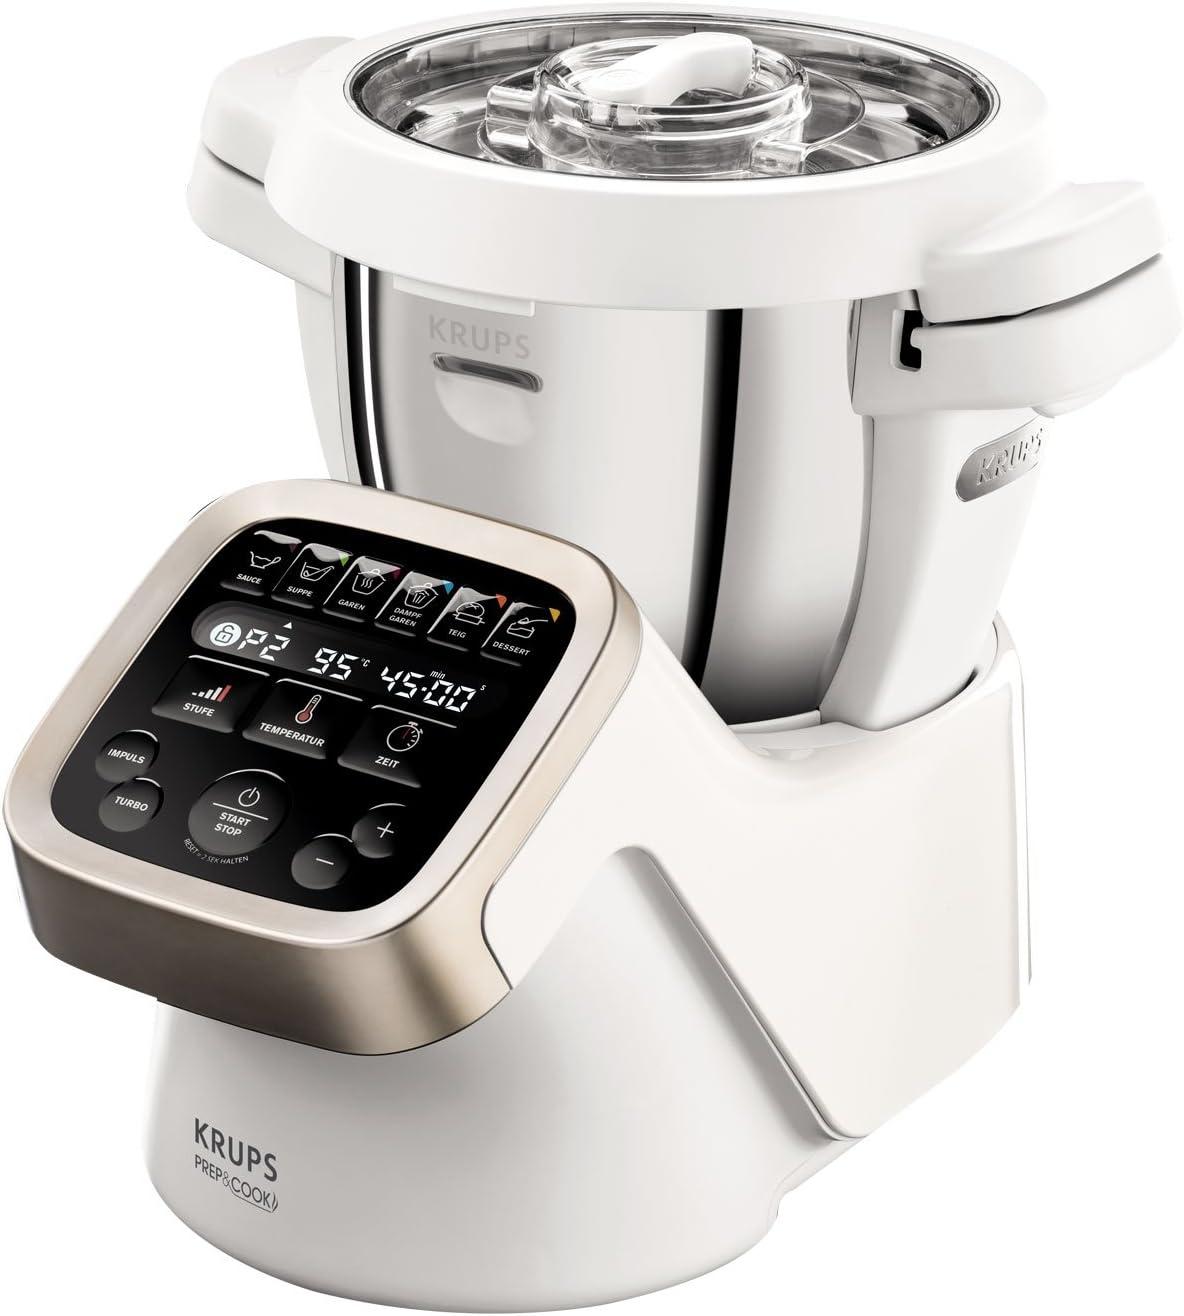 Krups HP5031 Prep & Cook – Robot de cocina multifunción Incluye ...